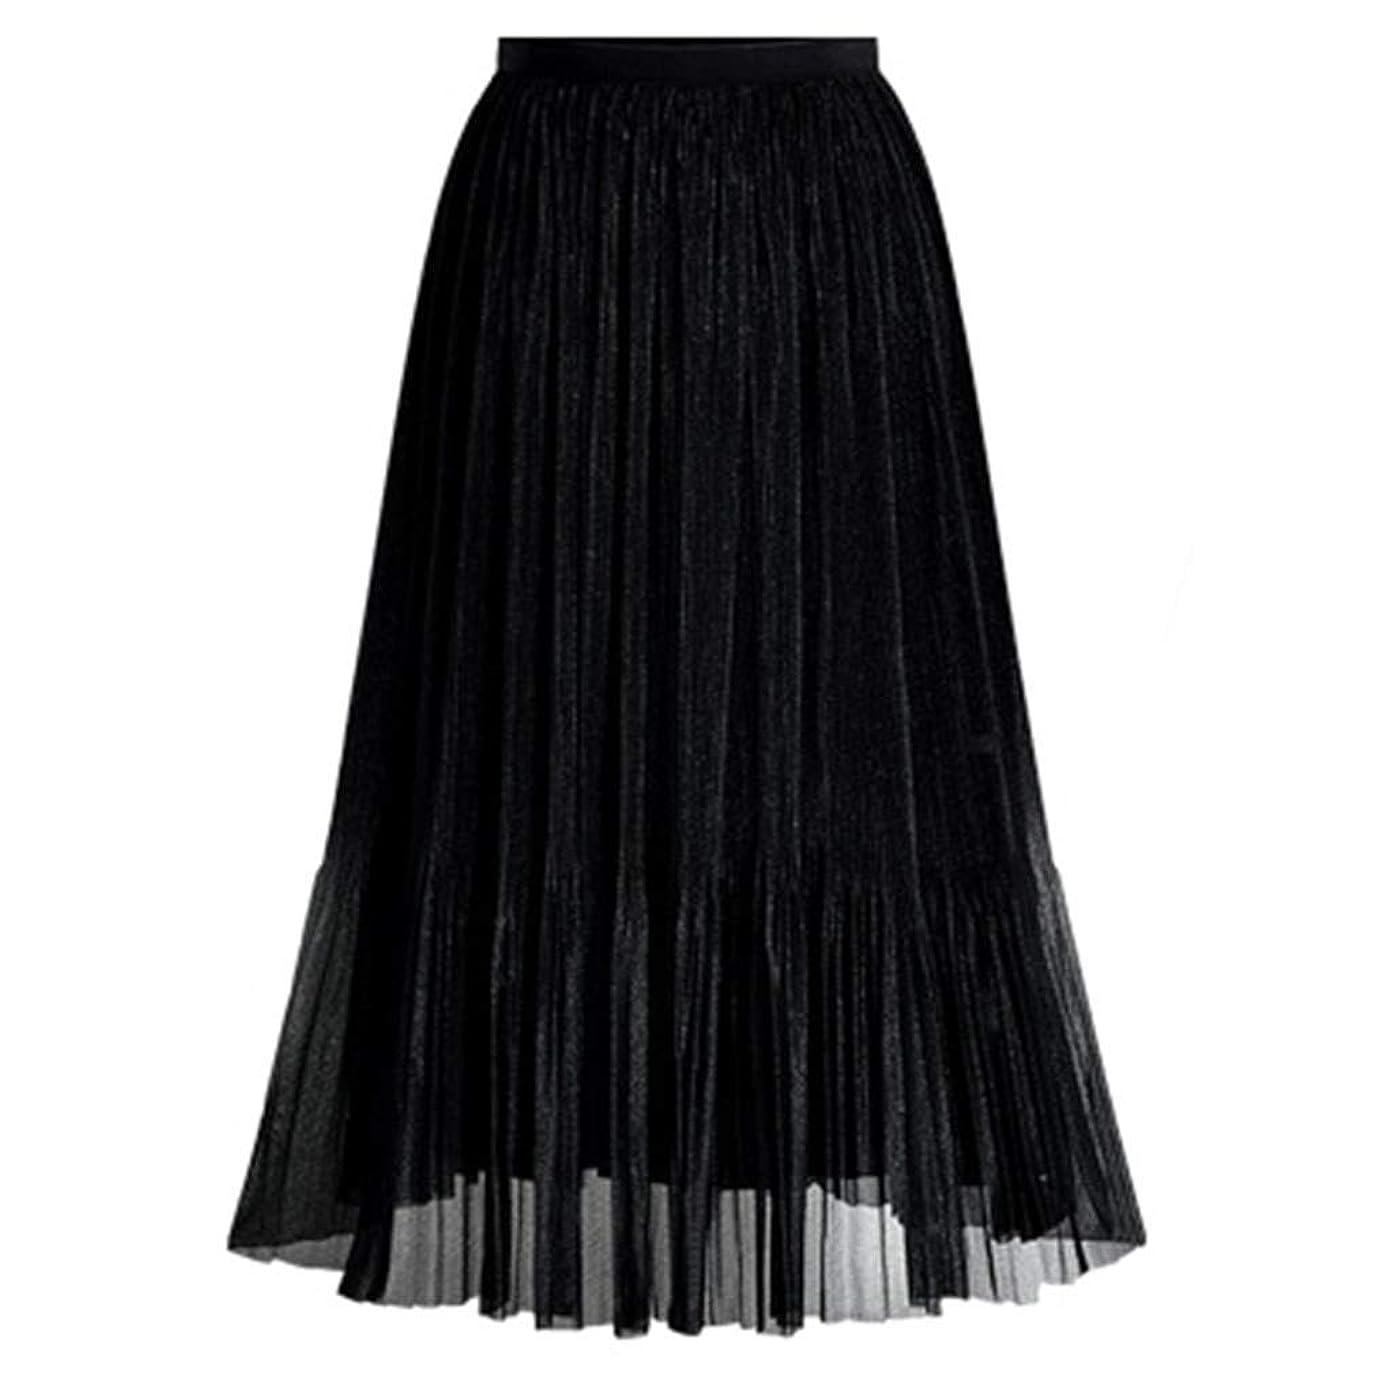 〓COOlCCI〓Women's Vintage Elastic Waist A-Line Long Midi Skirt Retro Long Maxi Skirt Vintage Dress Floor Length Skirt